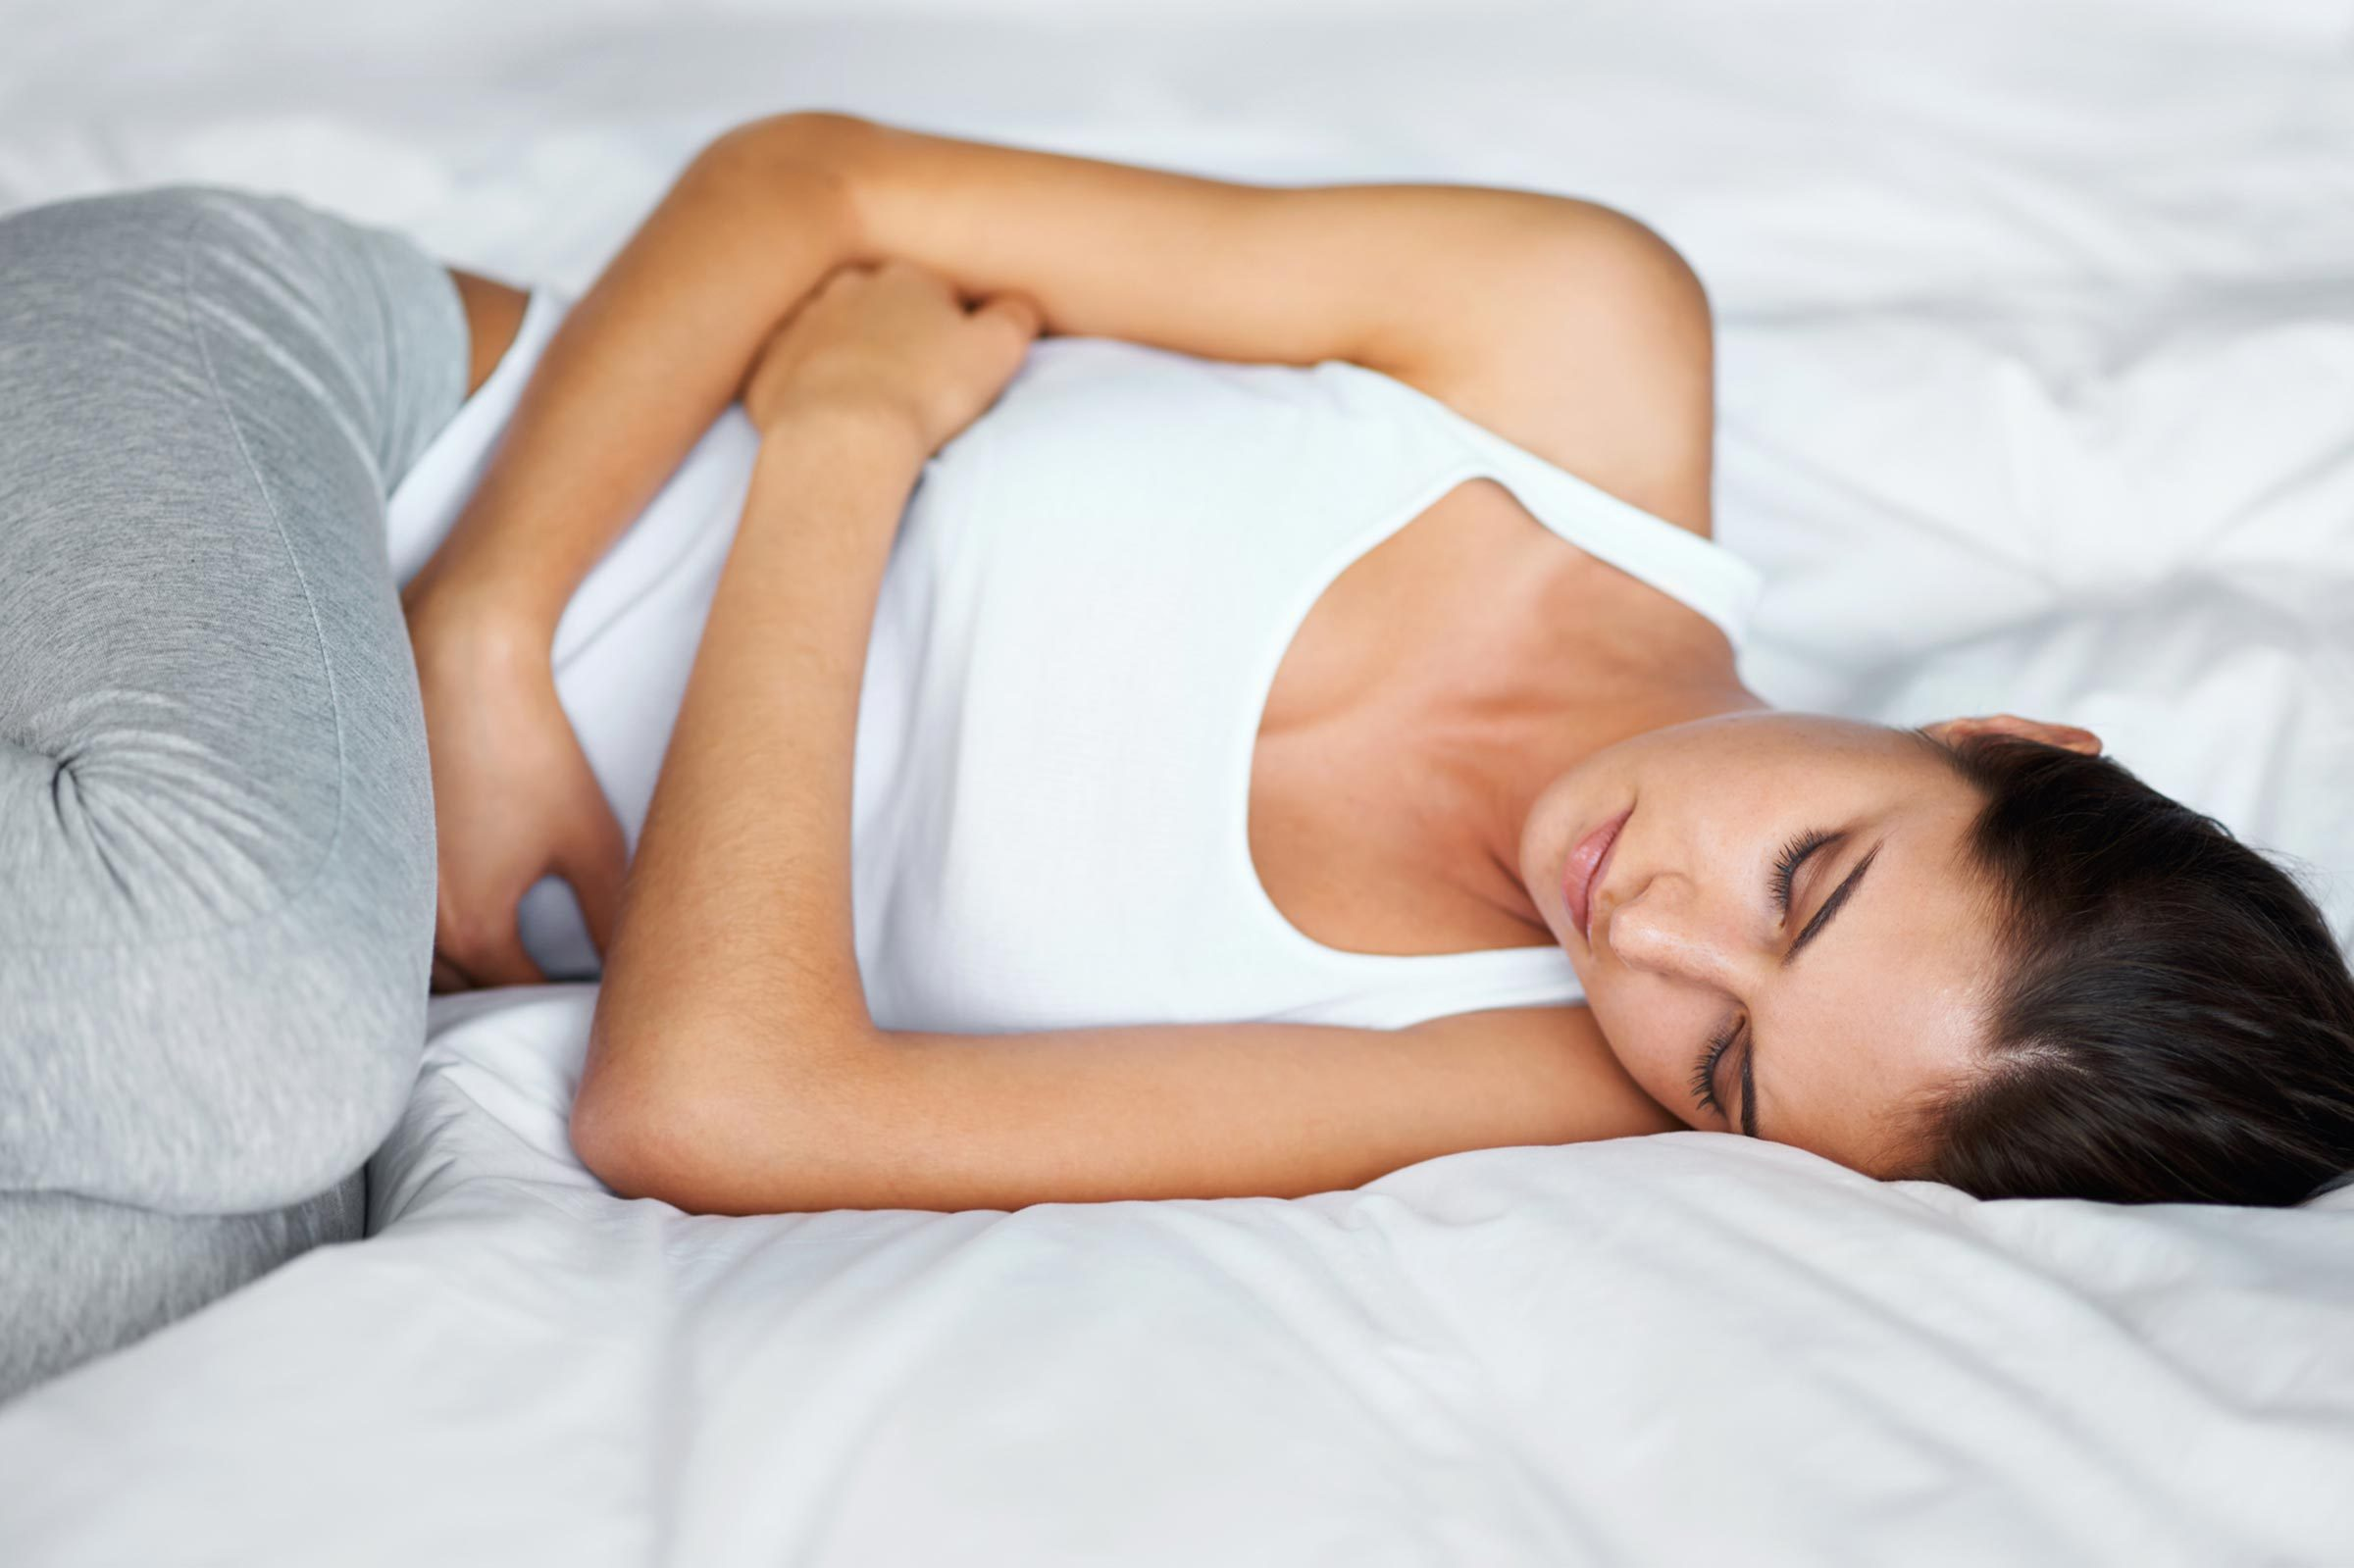 Heat Or Ice: Menstrual Cramps